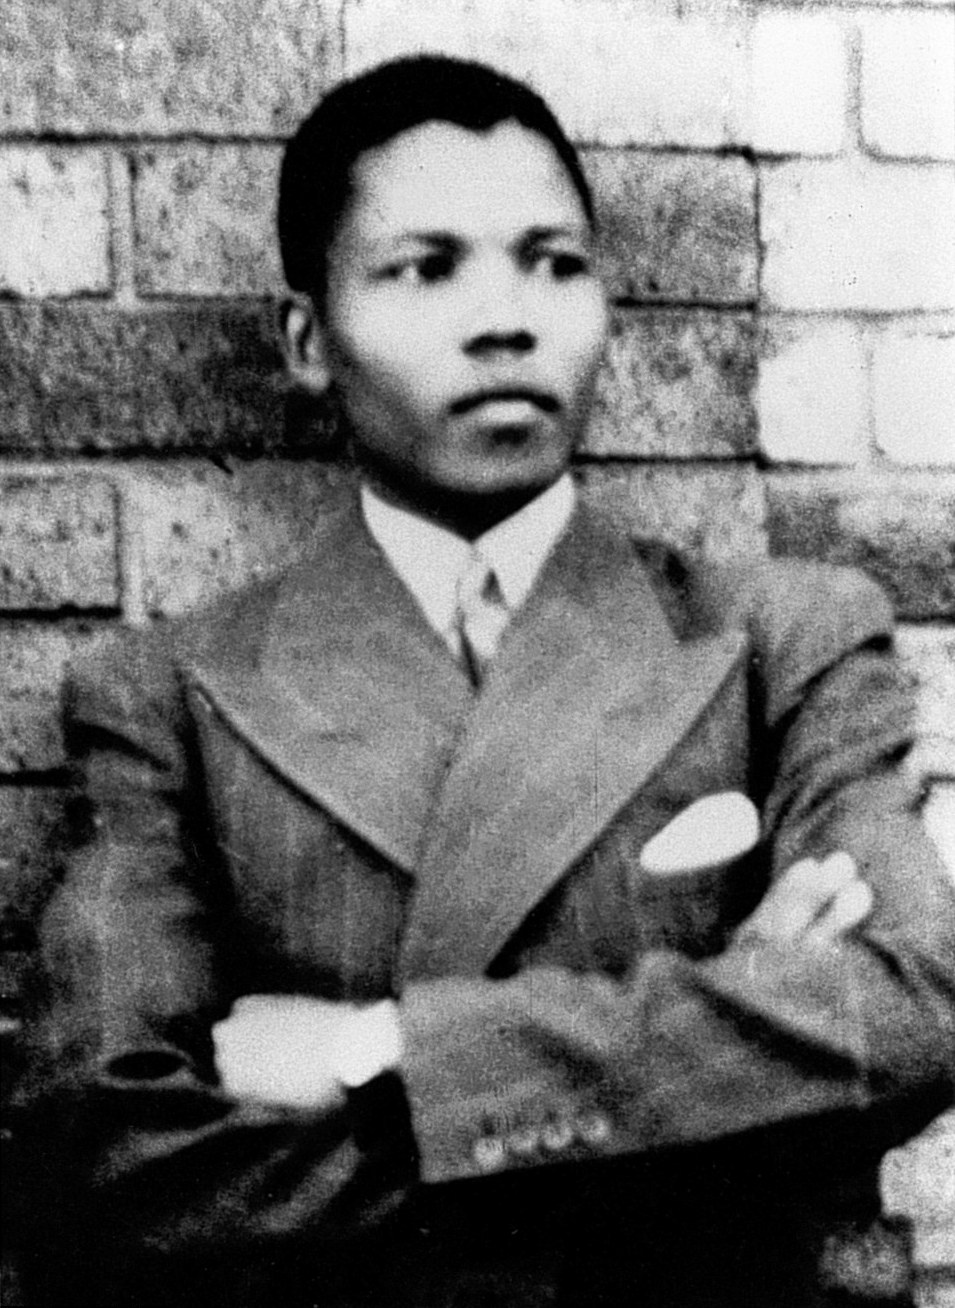 Young_Mandela.jpg